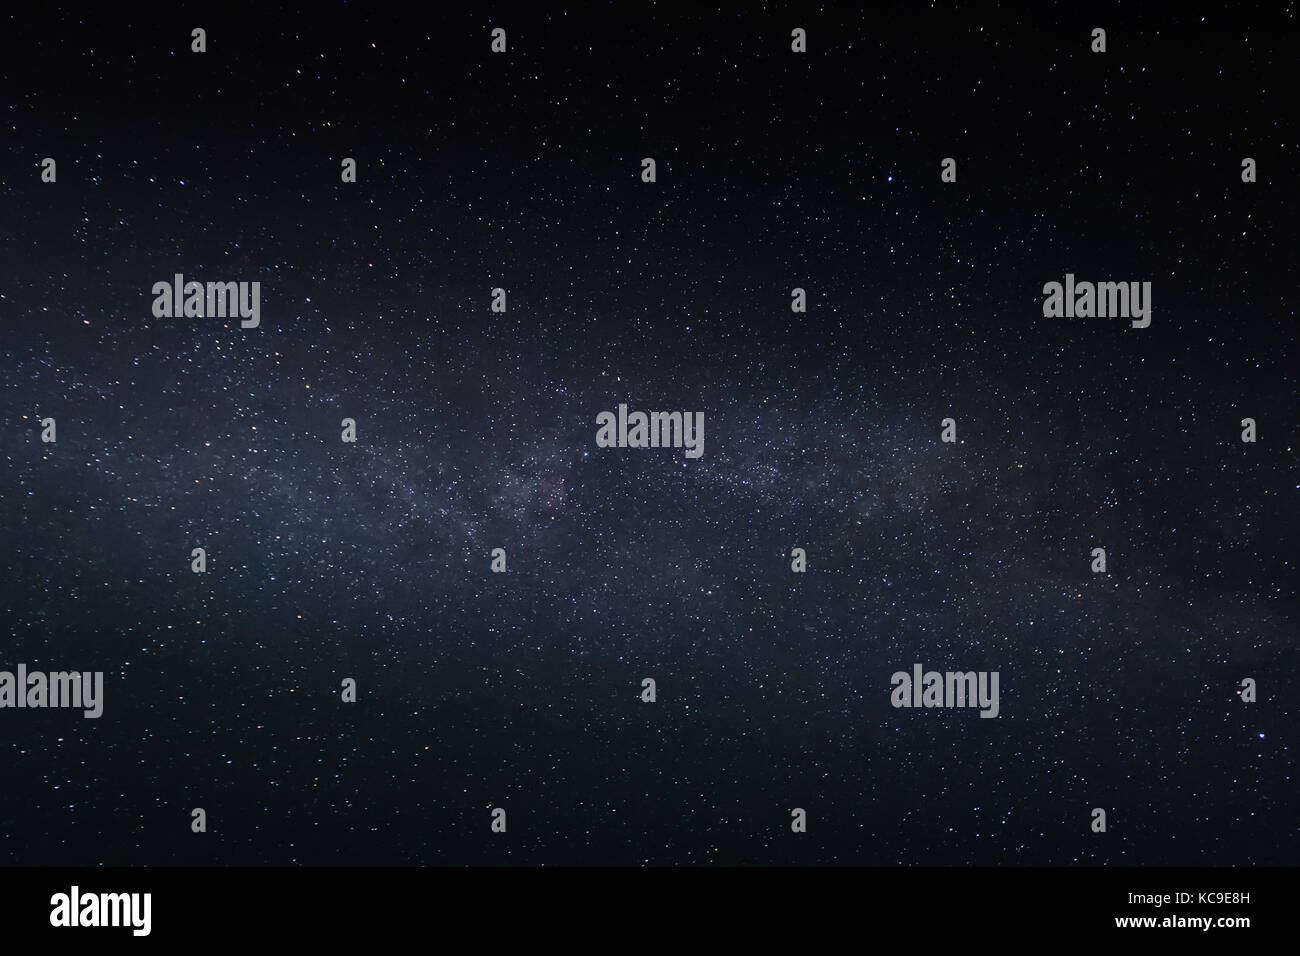 Galaxy stars night sky - Stock Image